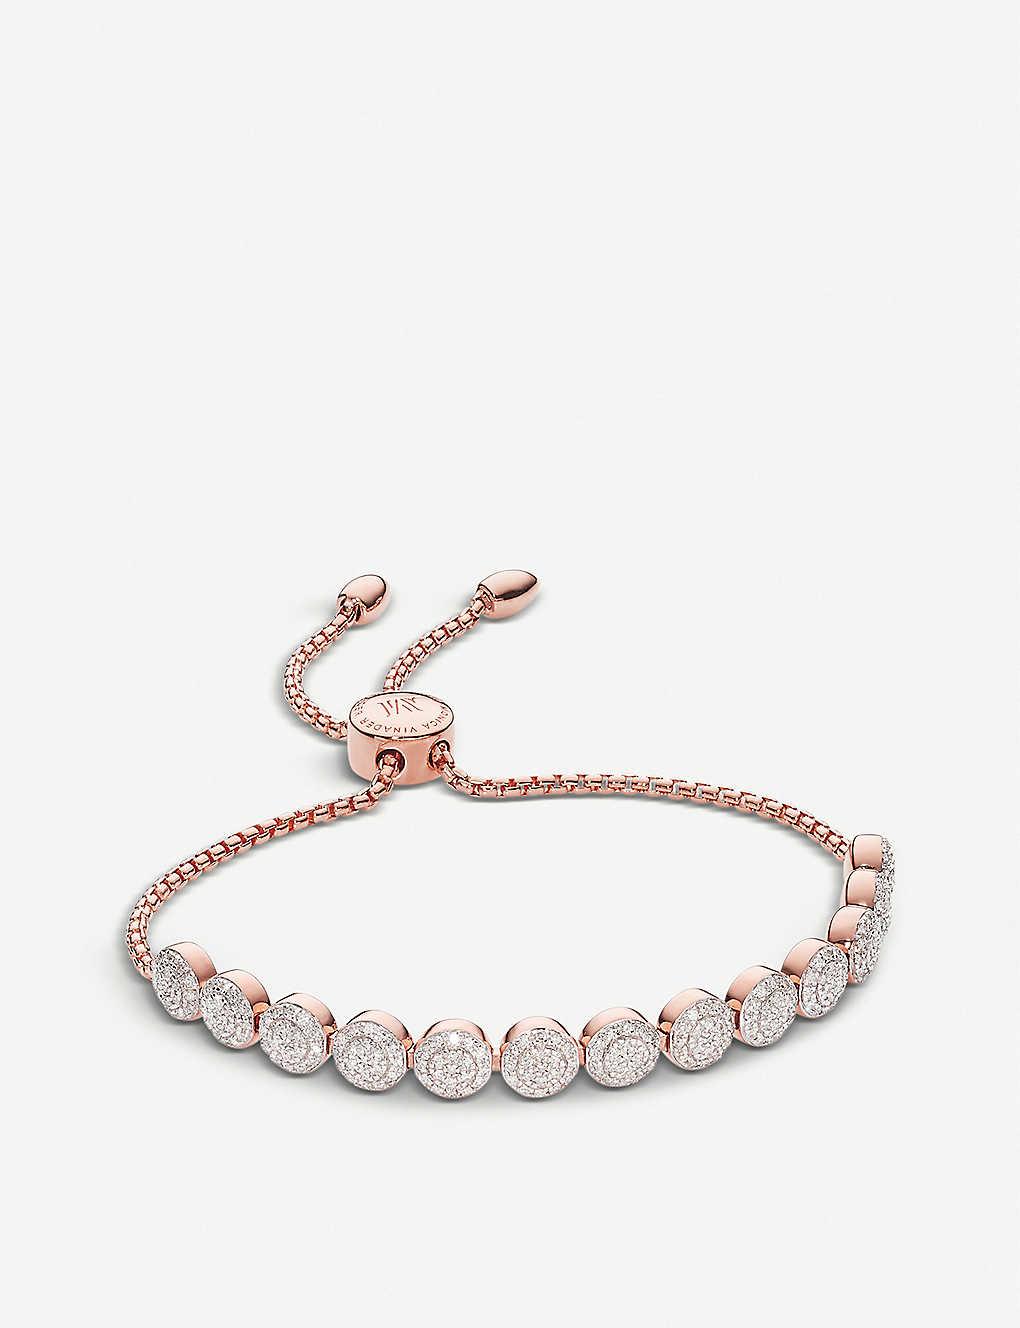 Gold Fiji Button Friendship Chain Bracelet Diamond Monica Vinader IYzkVG